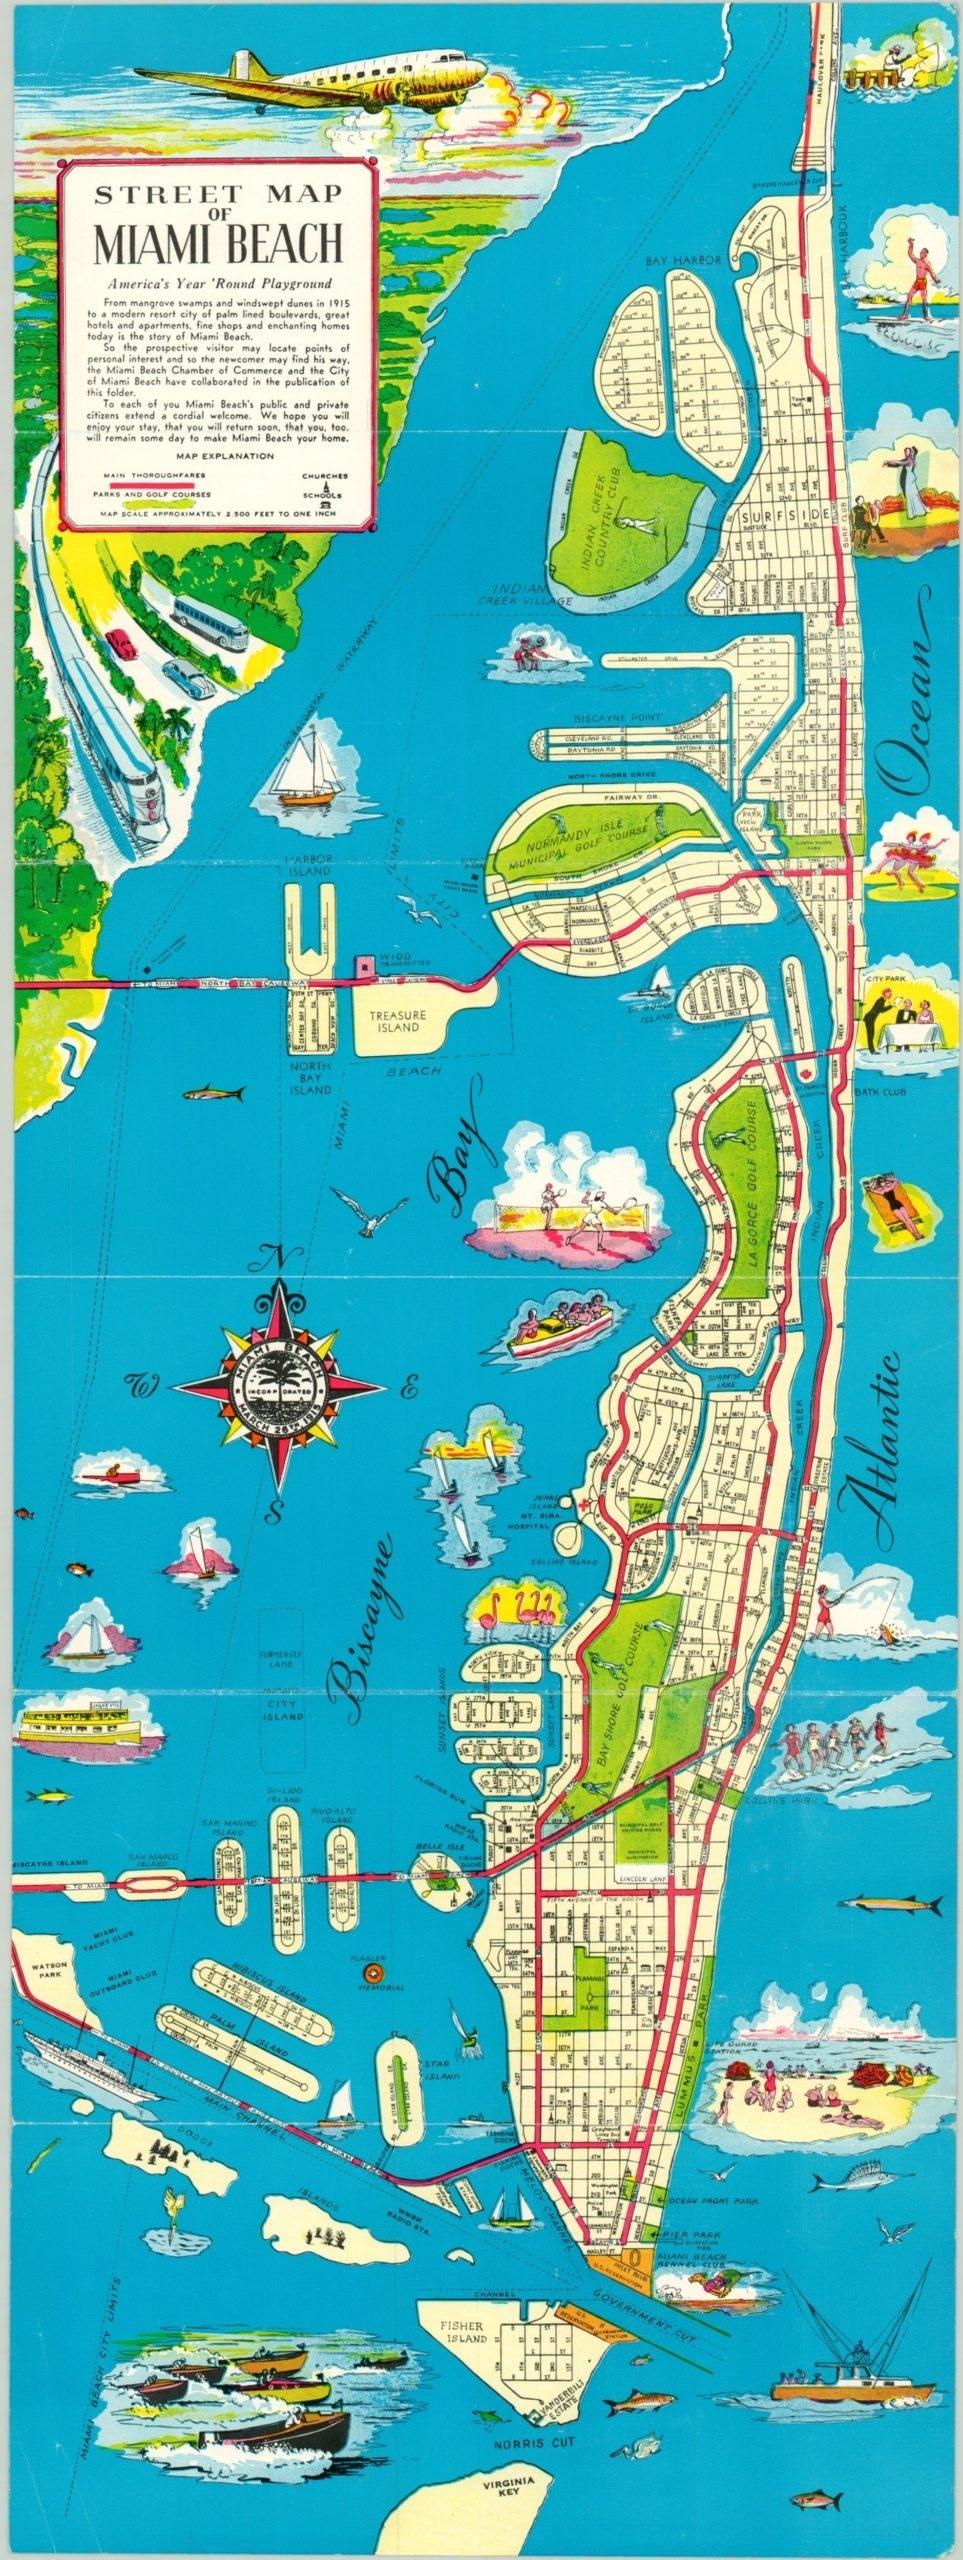 Street Map Of Miami Beach | Curtis Wright Maps within Miami Beach City Map